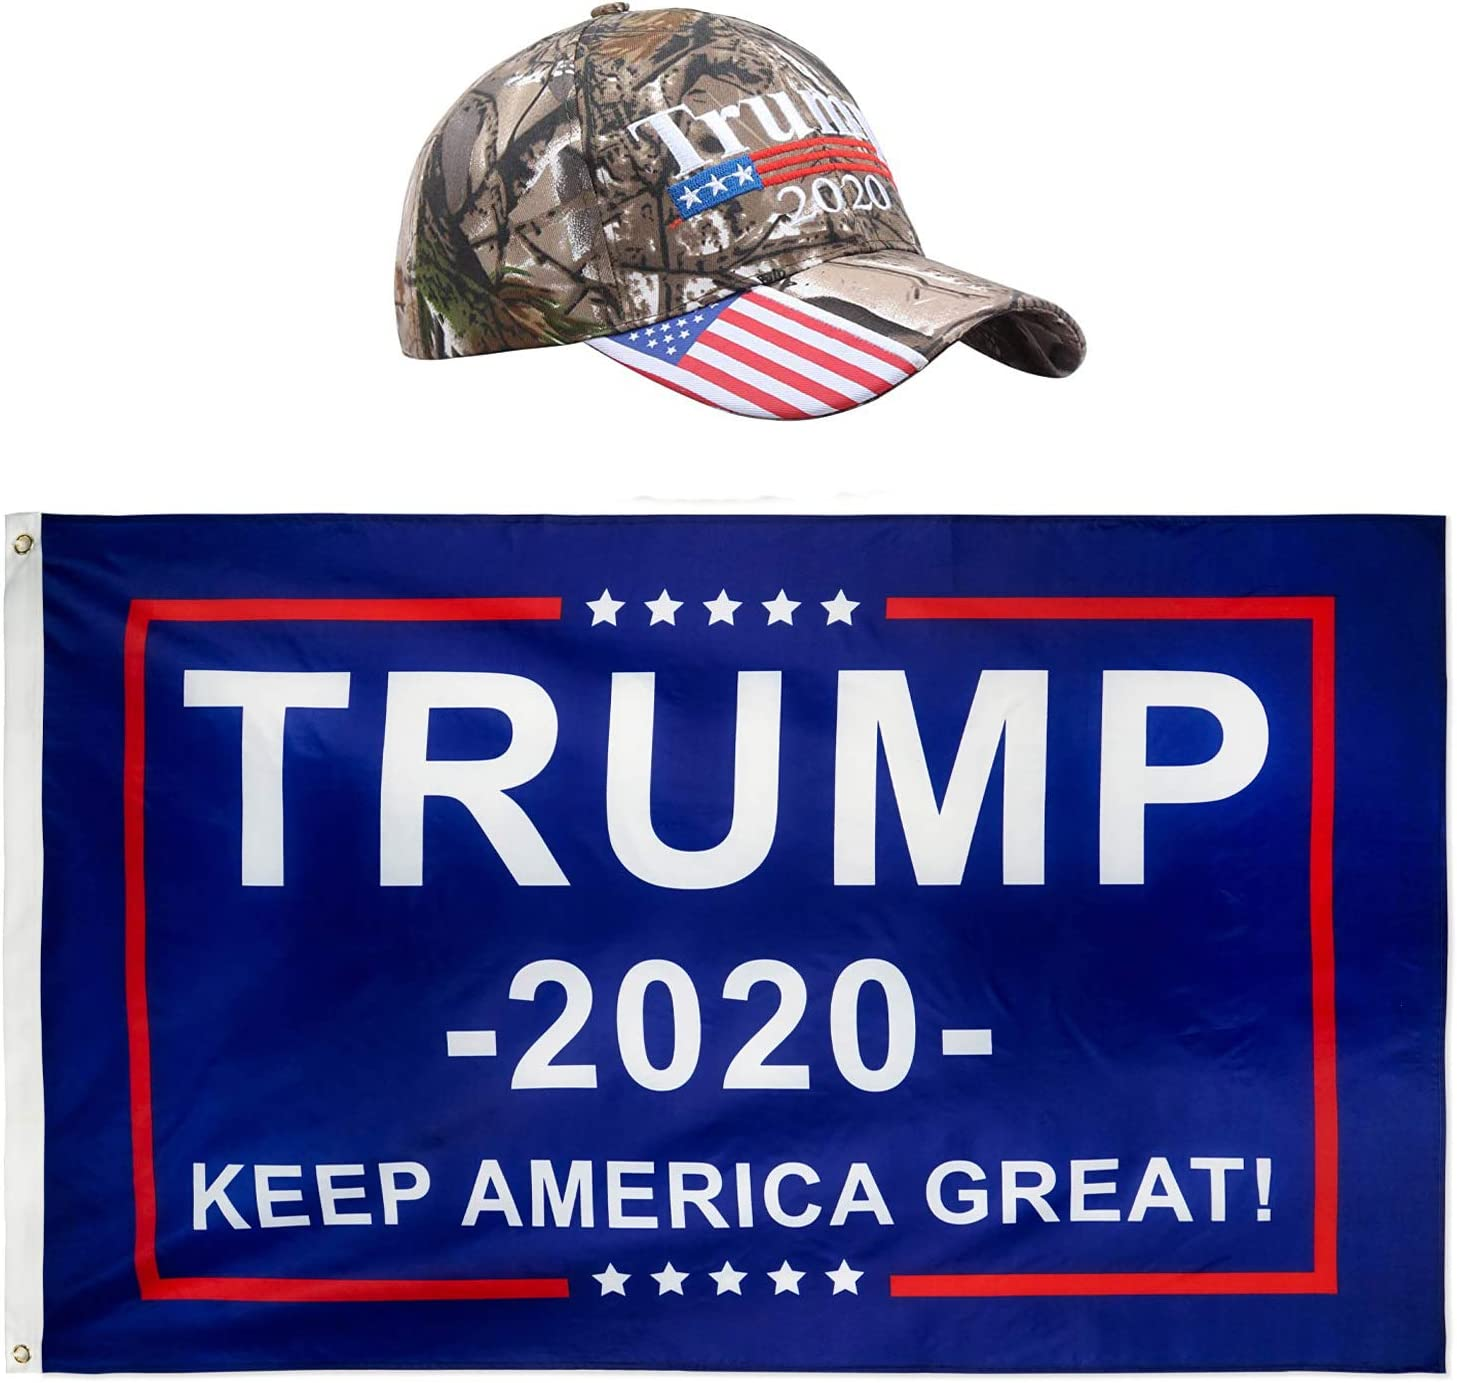 DFLIVE Donald Trump President 2020 Keep America Great Flag 3x5 FT and KAG Hat USA Adjustable Baseball Cap